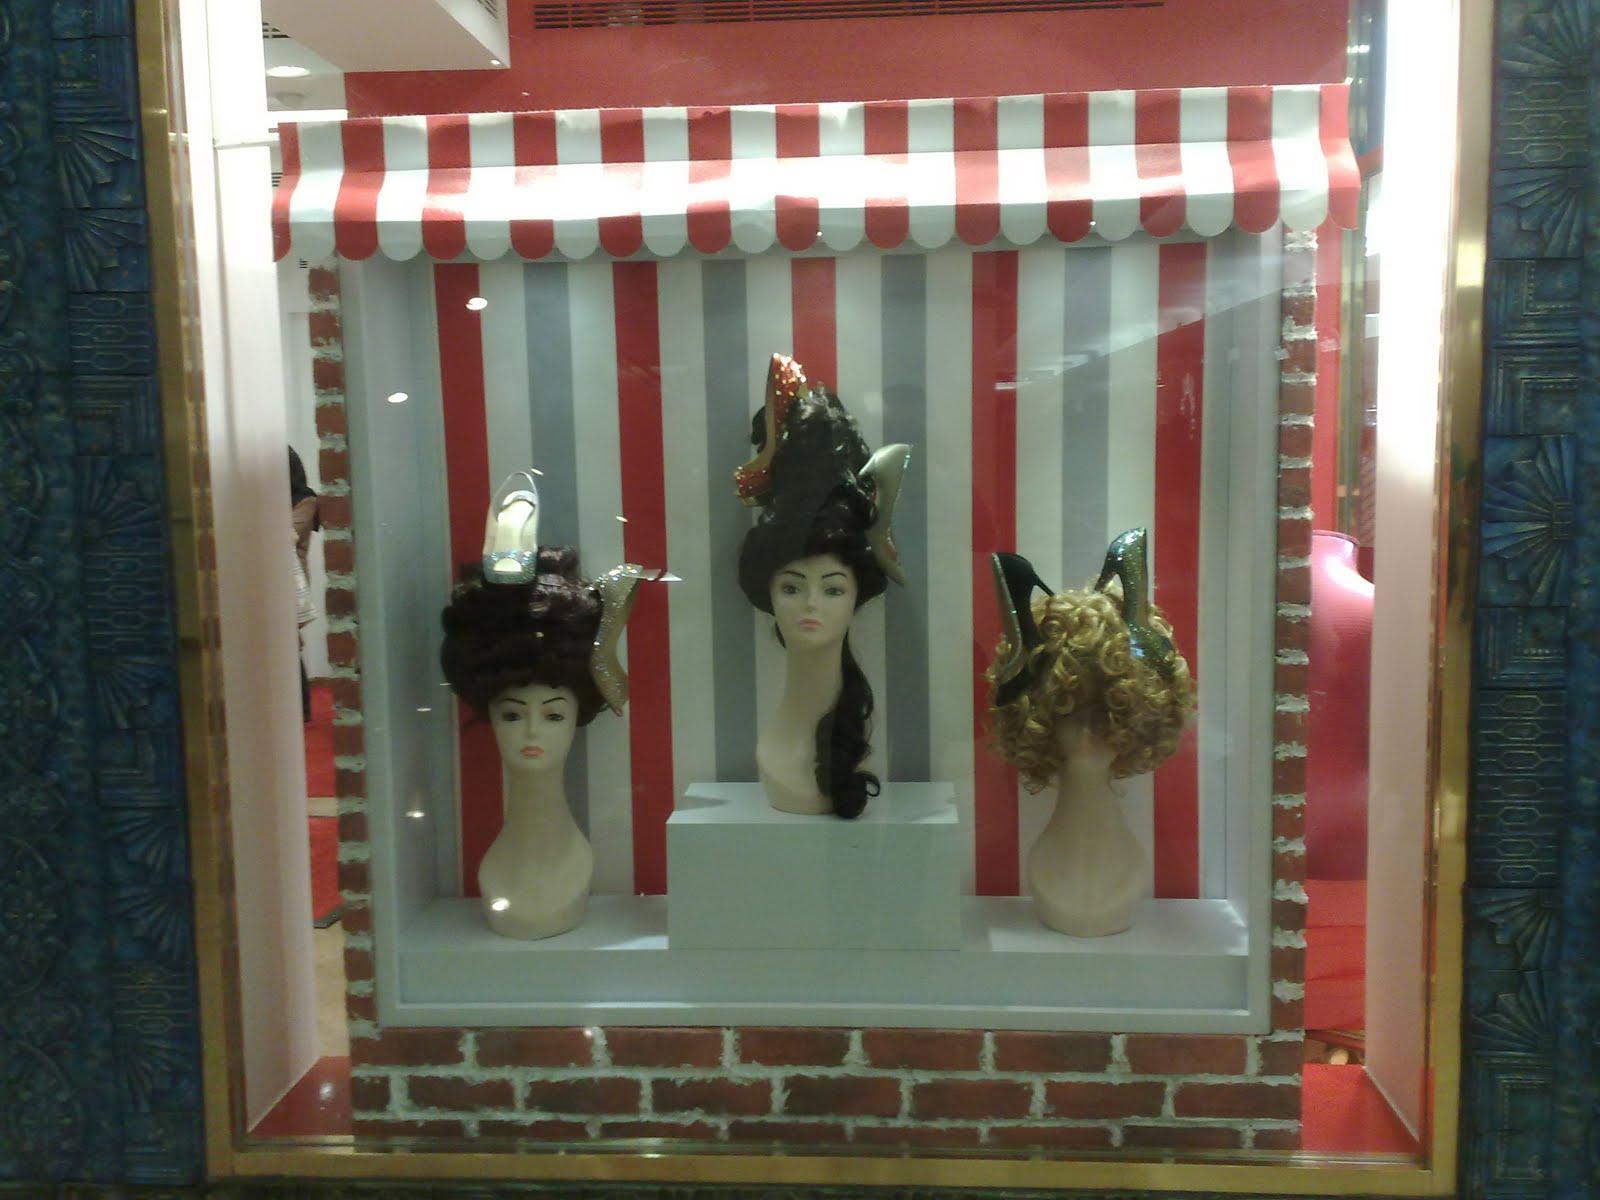 Displayhunter christian louboutin hair salon for Salon xmas decorations